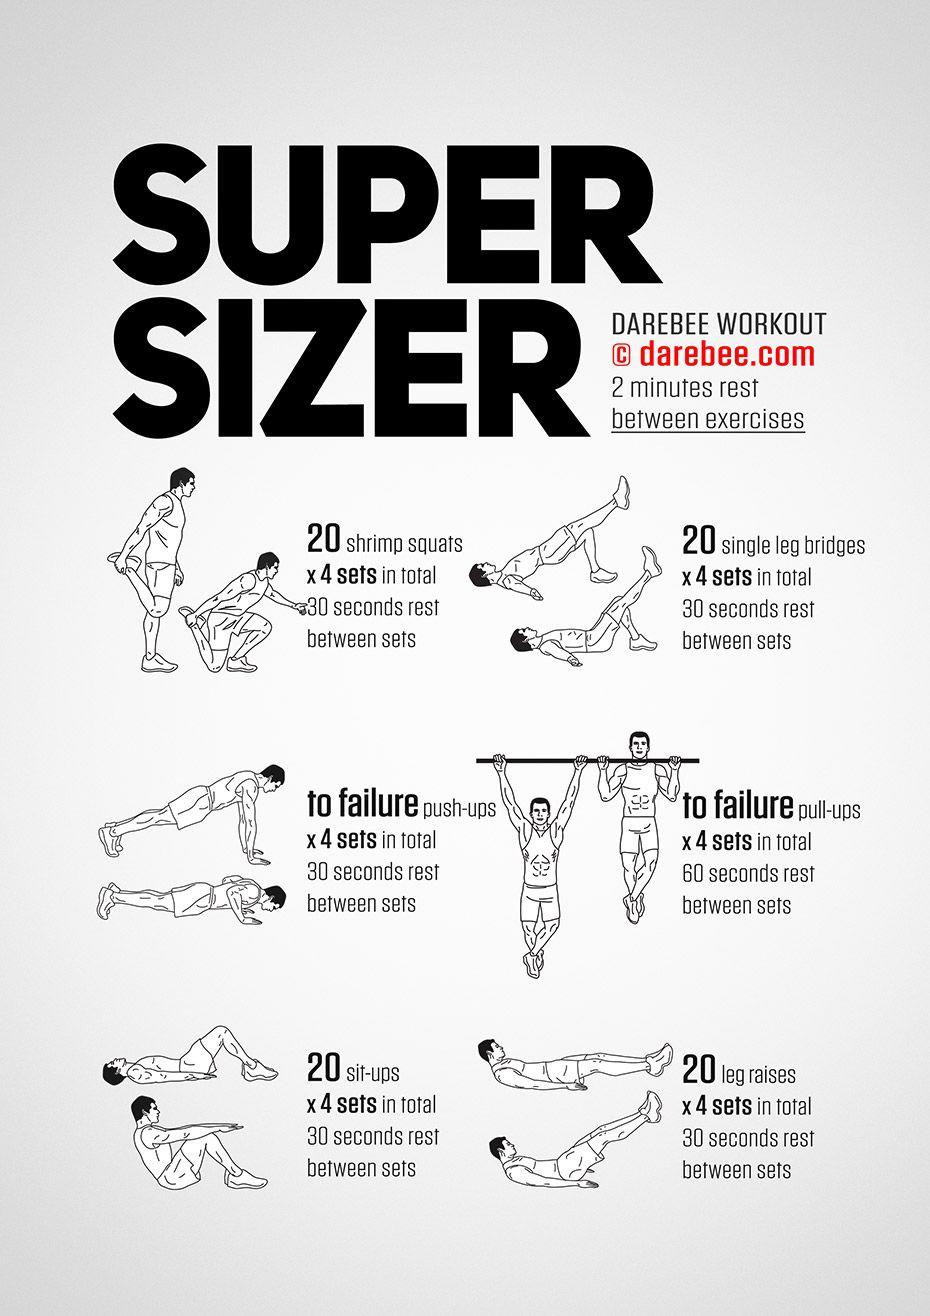 Supersizer Workout